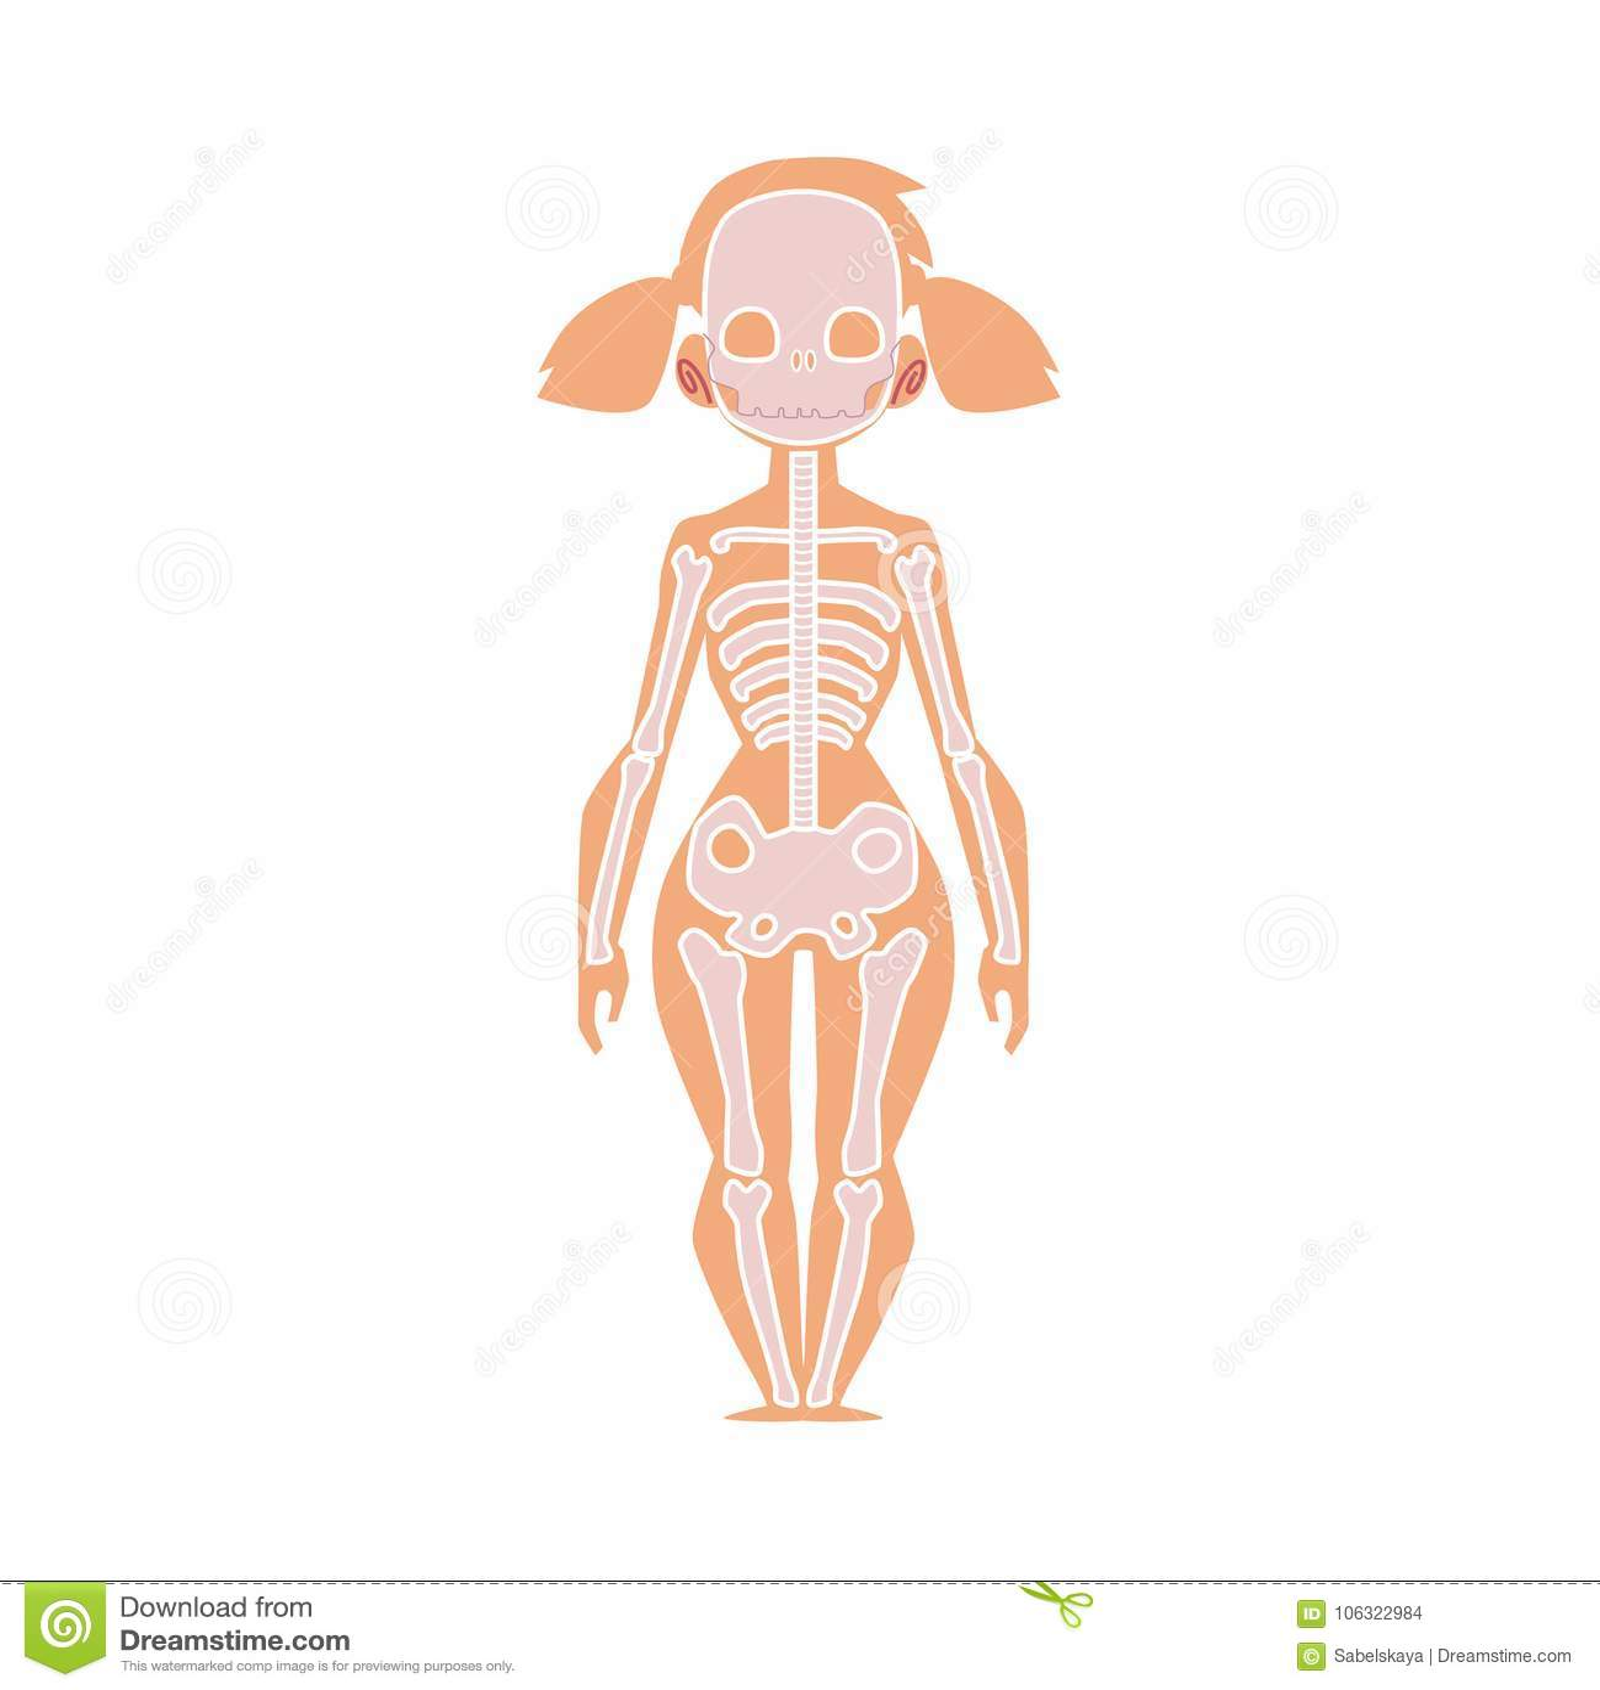 Anatomy Chart Of Human Skeleton, Female Body Stock Vector ...